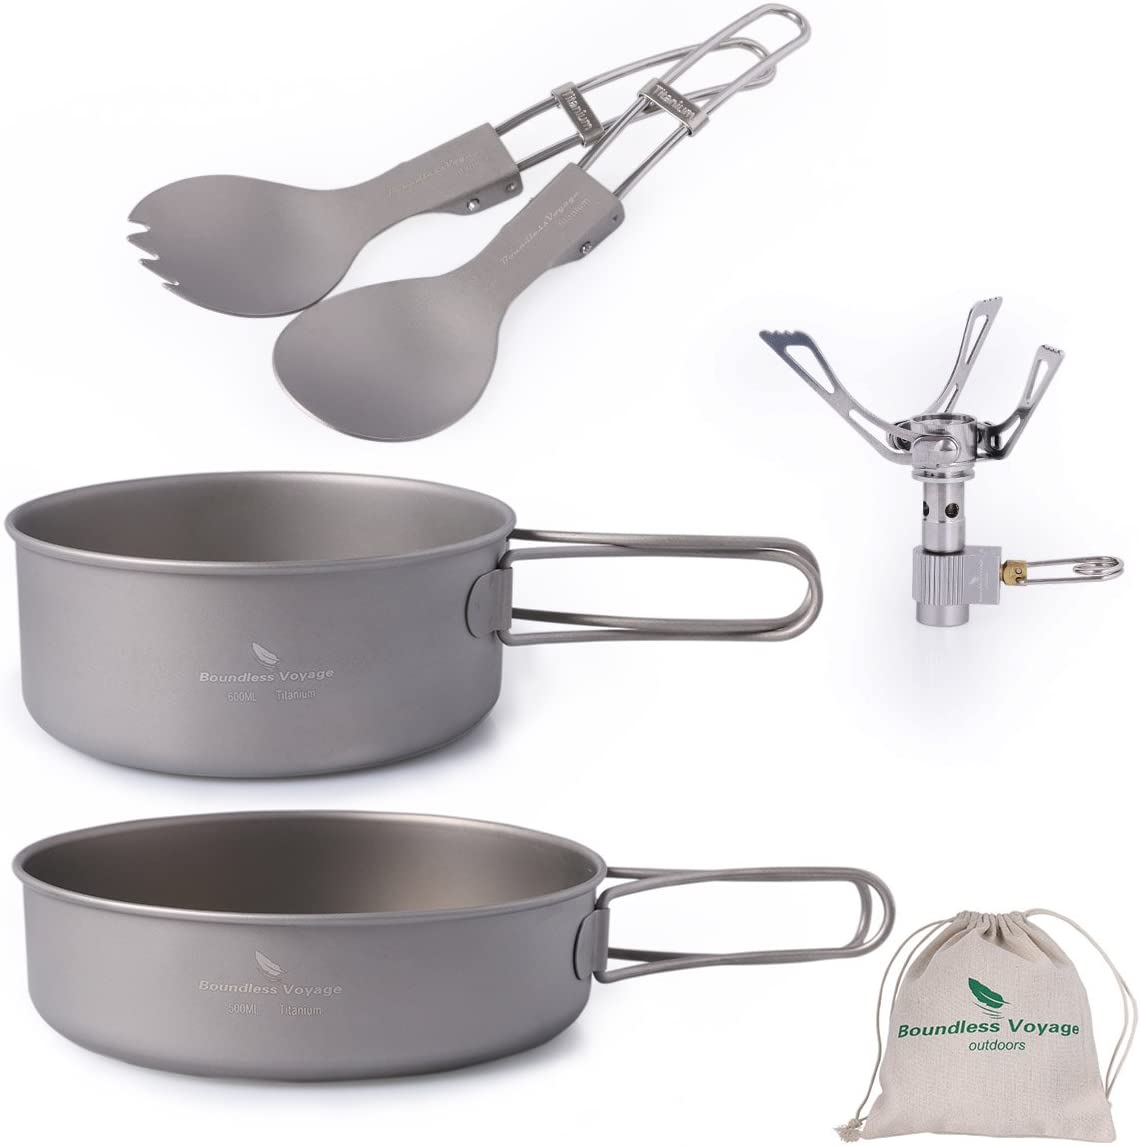 iBasingo Titanium Pots Set Mini Camping Titanium Bowl Set Outdoor Cookware Cooking Pan Pot with Folding-handle Travel Kitchen Mess Kits Picnic Hiking Dishes for 1 Person